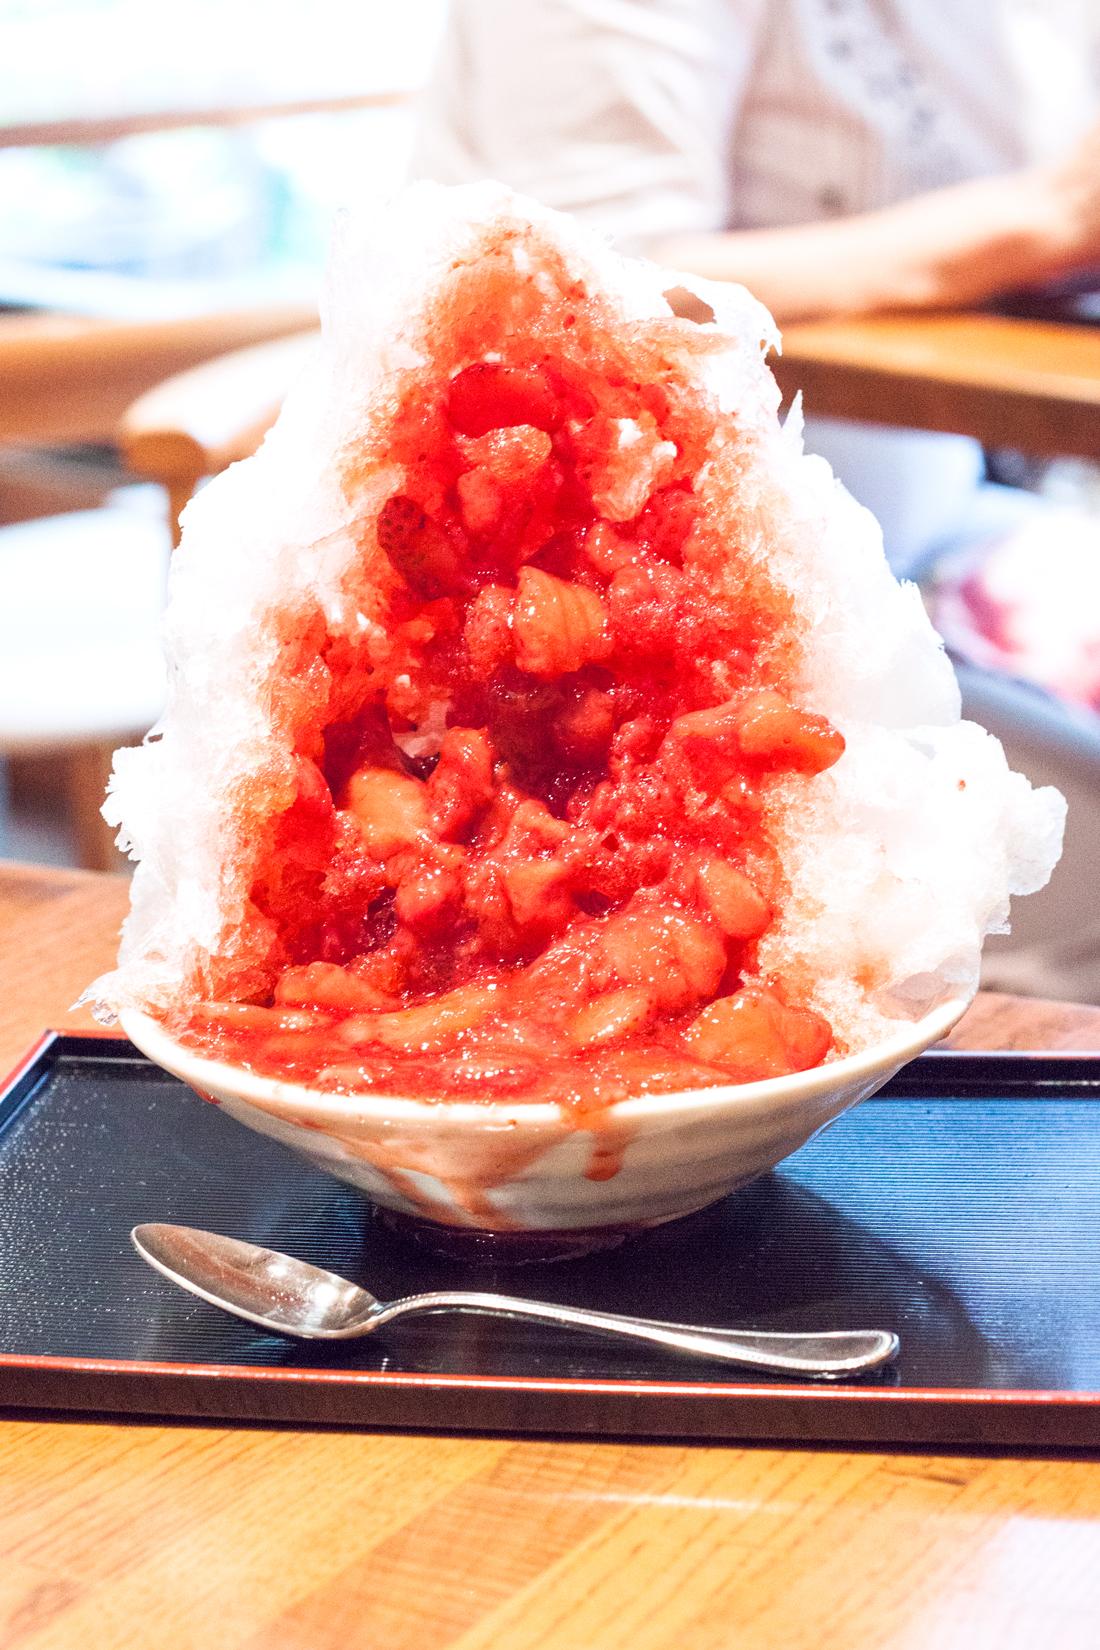 Shimura mejiro kakigori, strawberry kakigori, matcha green tea kakigori, sake kakigori, azuki bean kakigori, mochi kakigori, japanese dessert, japan, tokyo, japanese restaurant